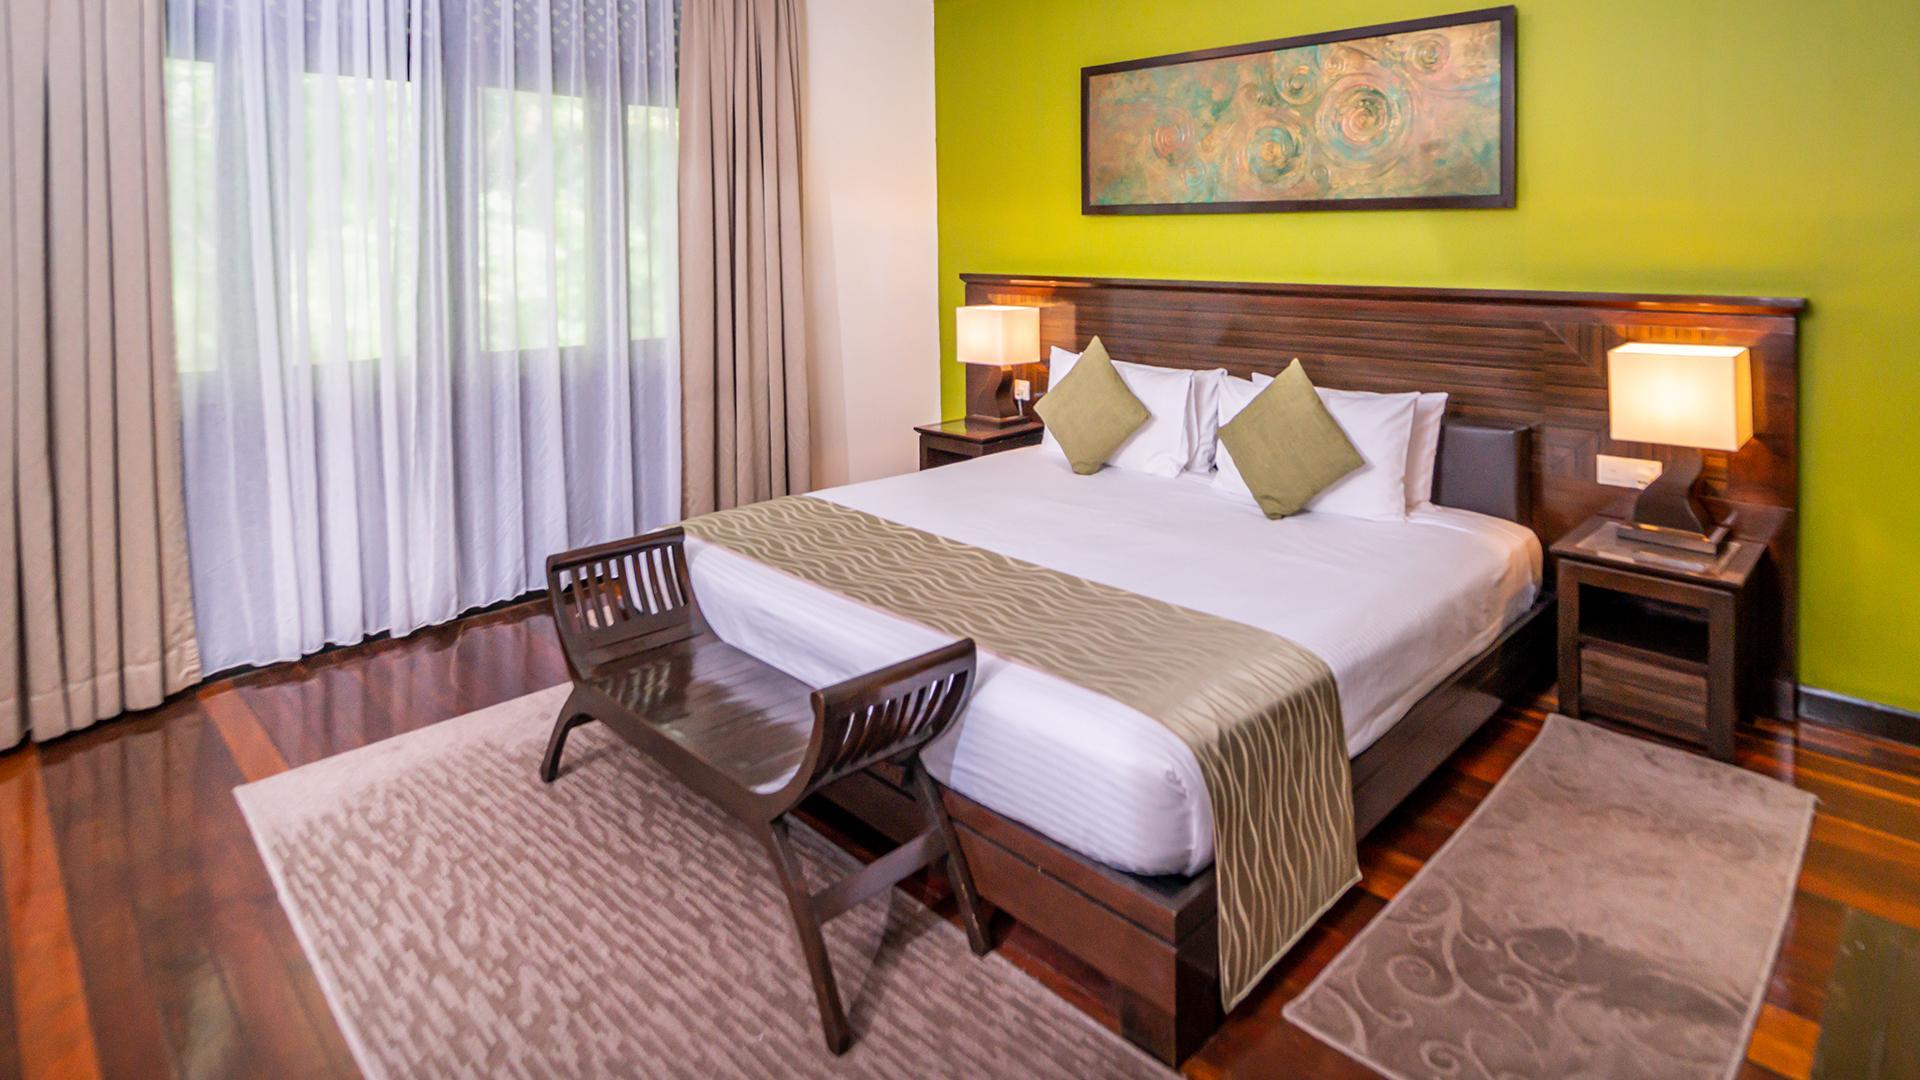 Luxury Two-Bedroom Garden-View Suite image 1 at Vivanta Langkawi, Rebak Island by null, Kedah, Malaysia